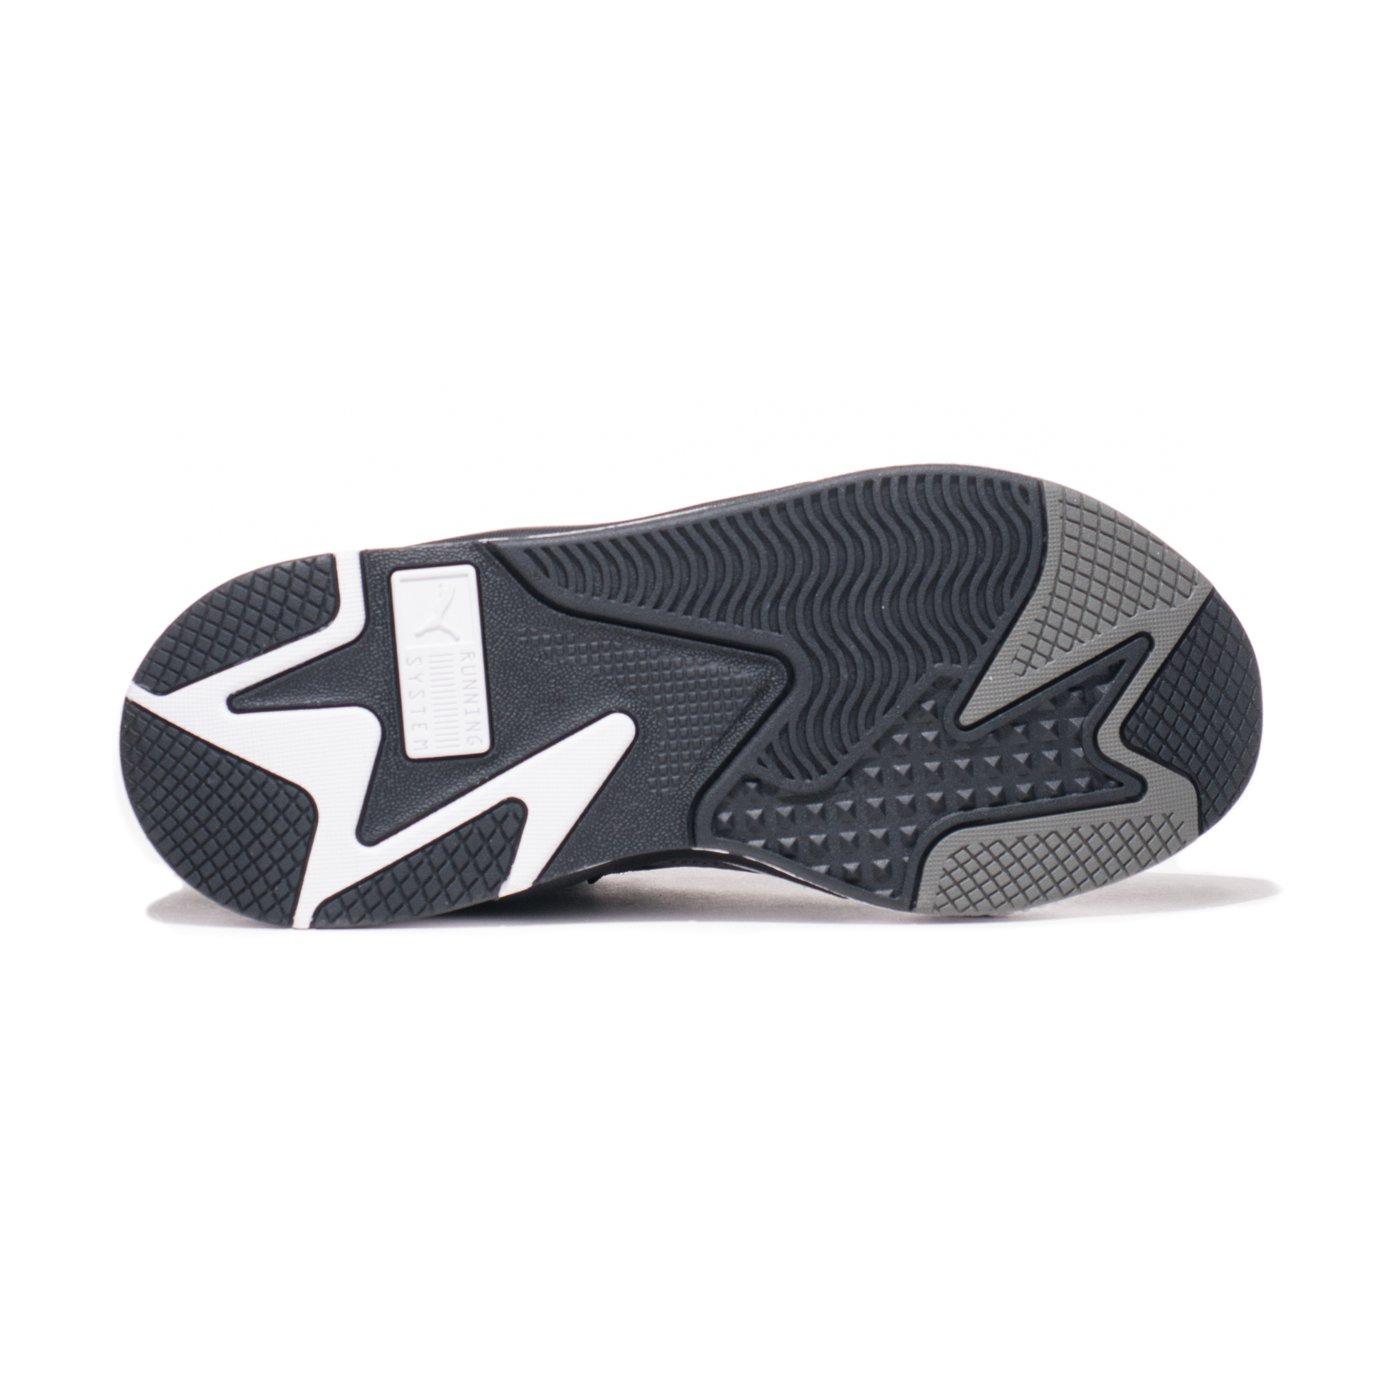 Кросівки чоловічі Puma RS-X MIX